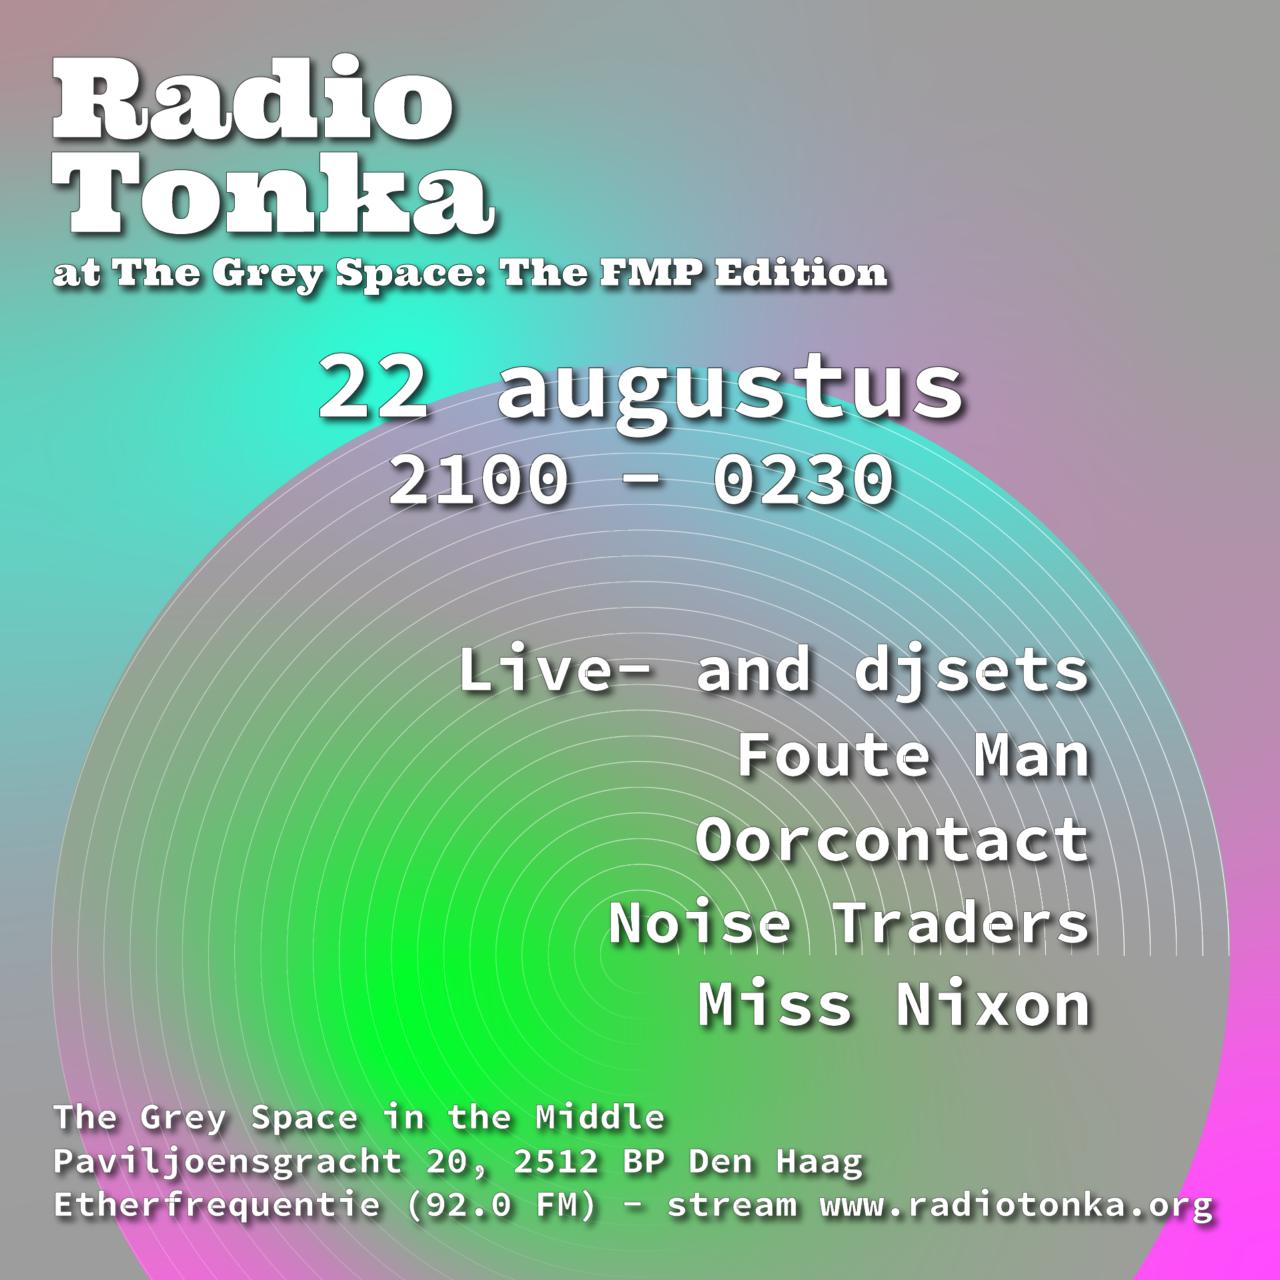 Radio Tonka: The FMP edition